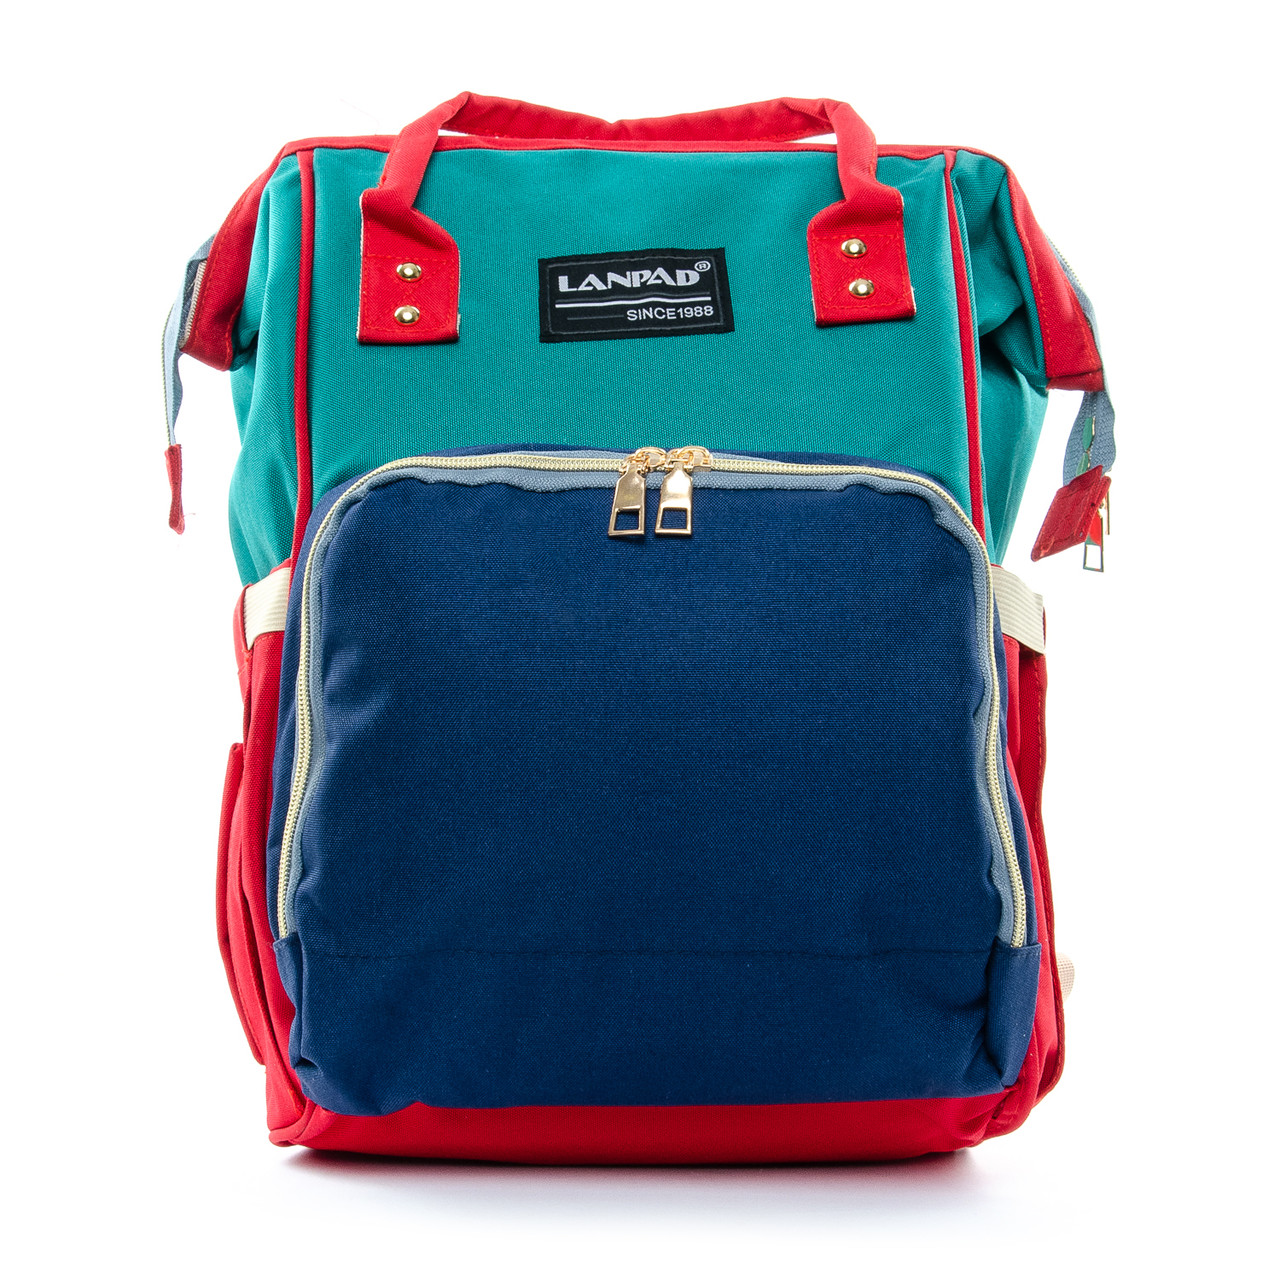 Сумка-рюкзак-органайзер для мамы  Lanpad D900 синий зеленый coral